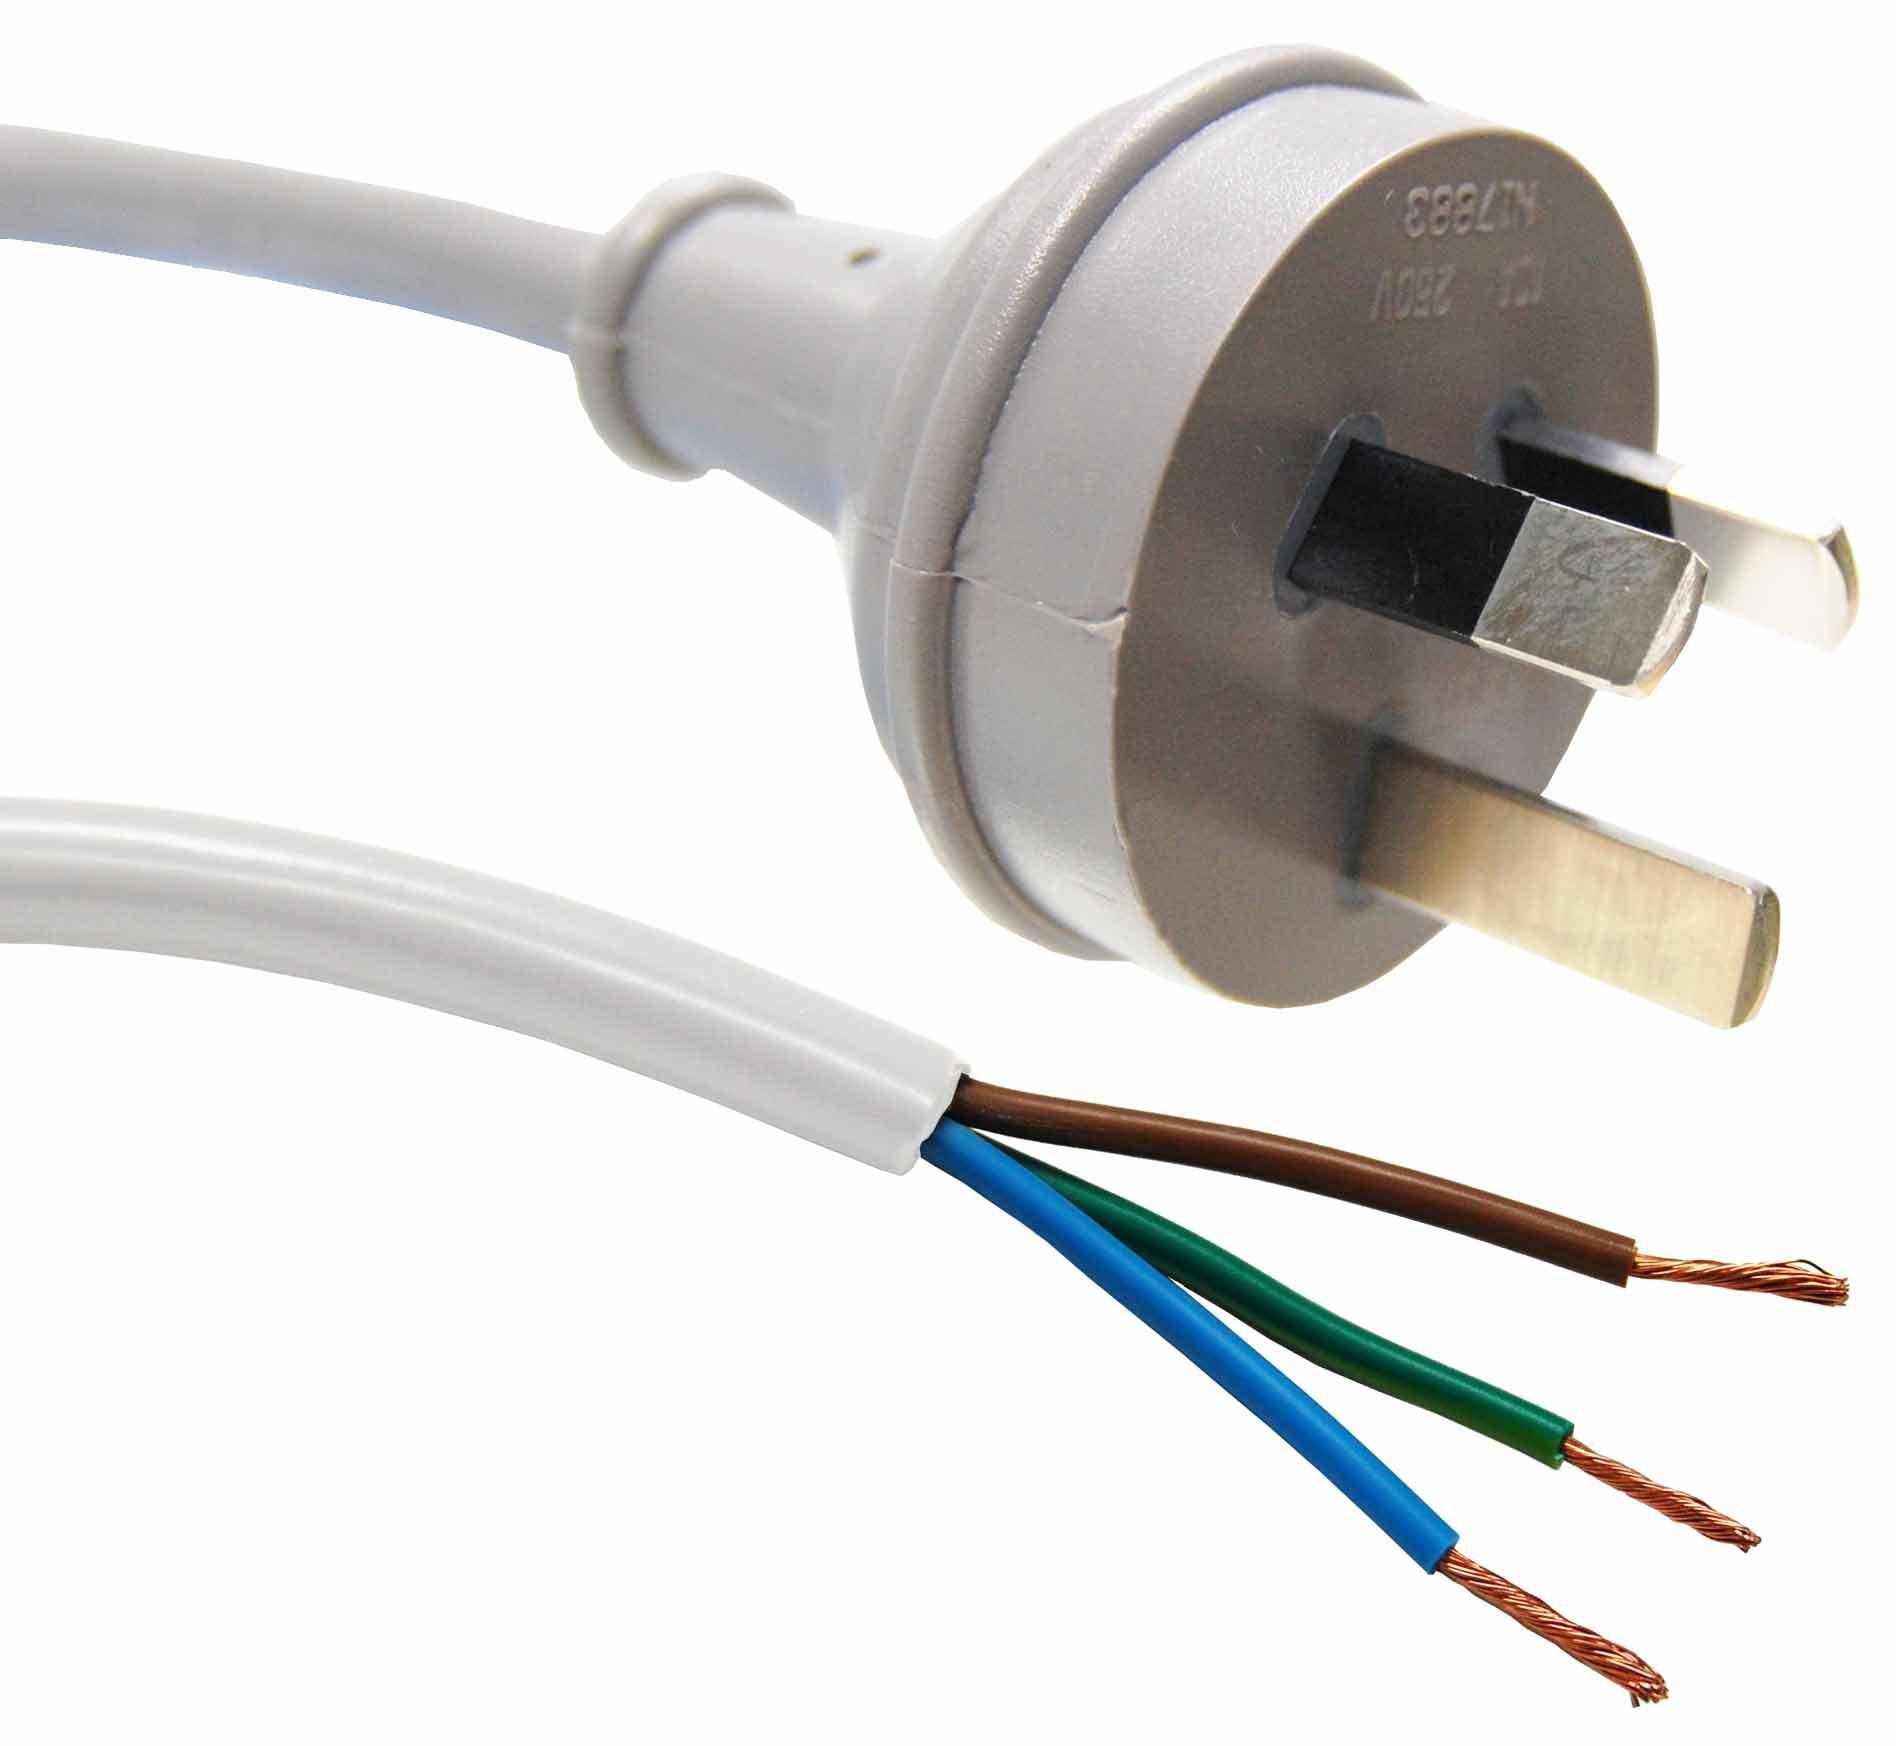 hight resolution of wire a plug nz wiring diagram for you trailer plug wiring nz electrical wiring nz wiring